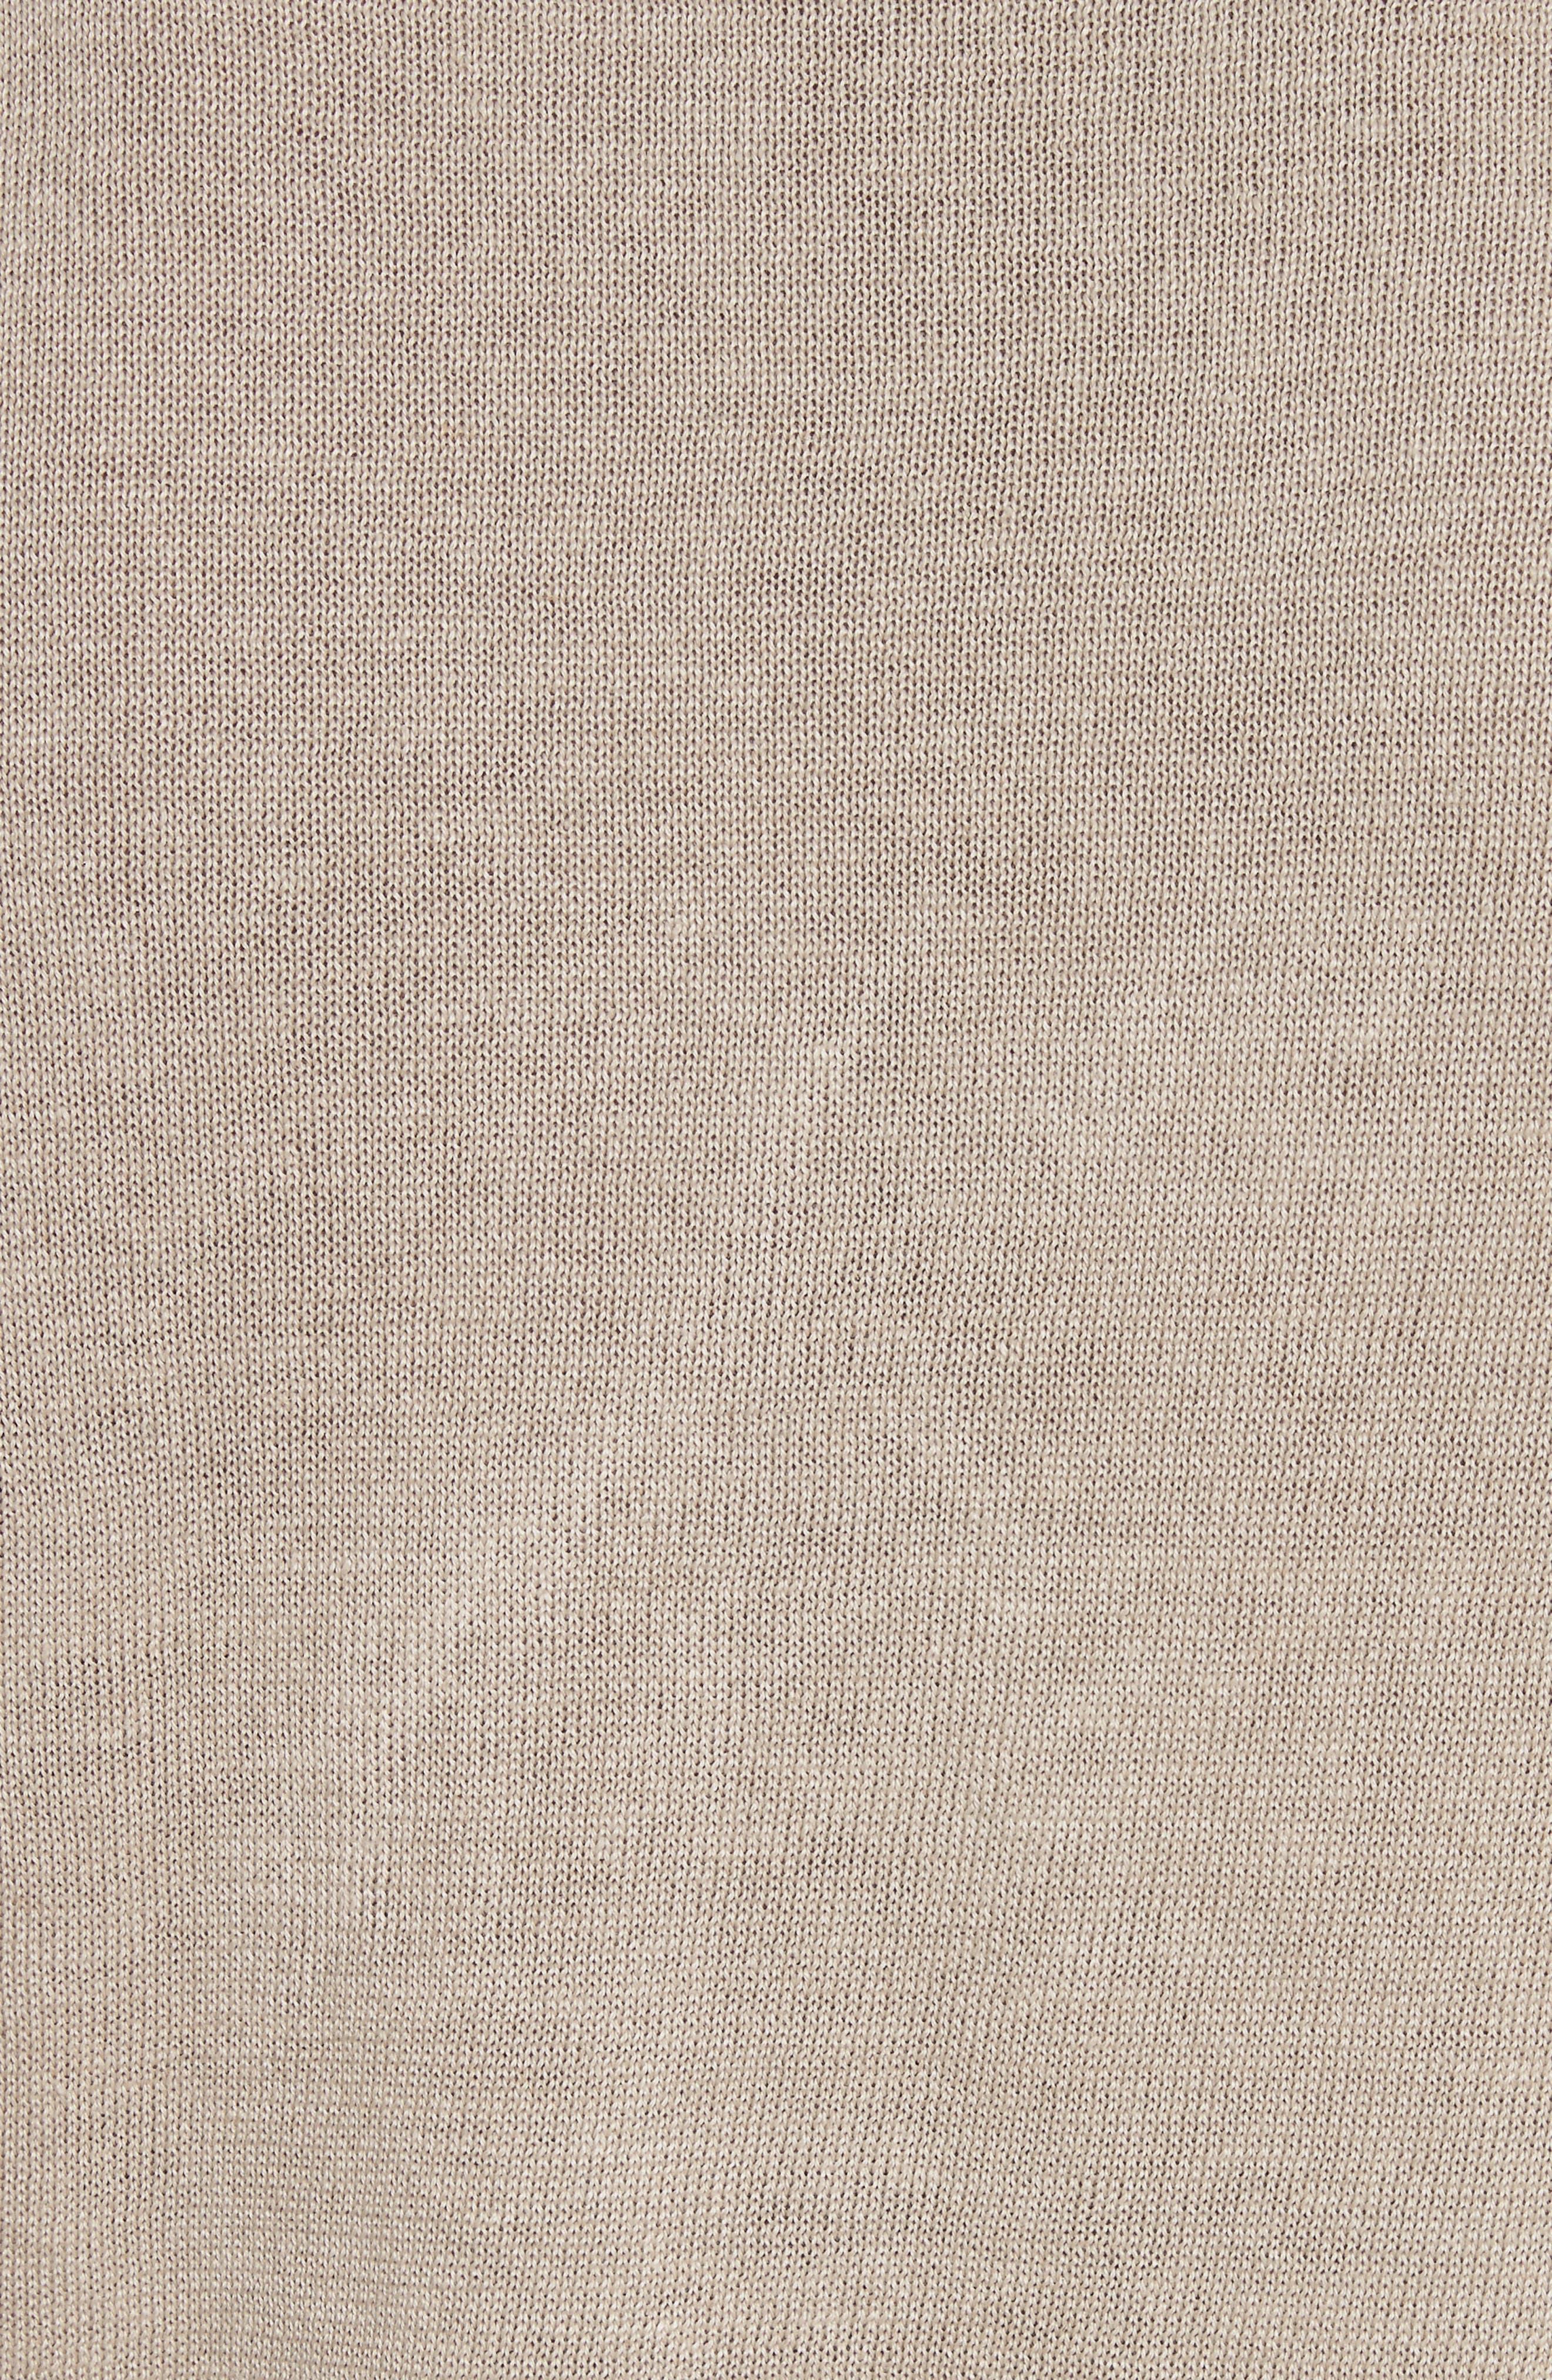 Exford Linen Crewneck Sweater,                             Alternate thumbnail 9, color,